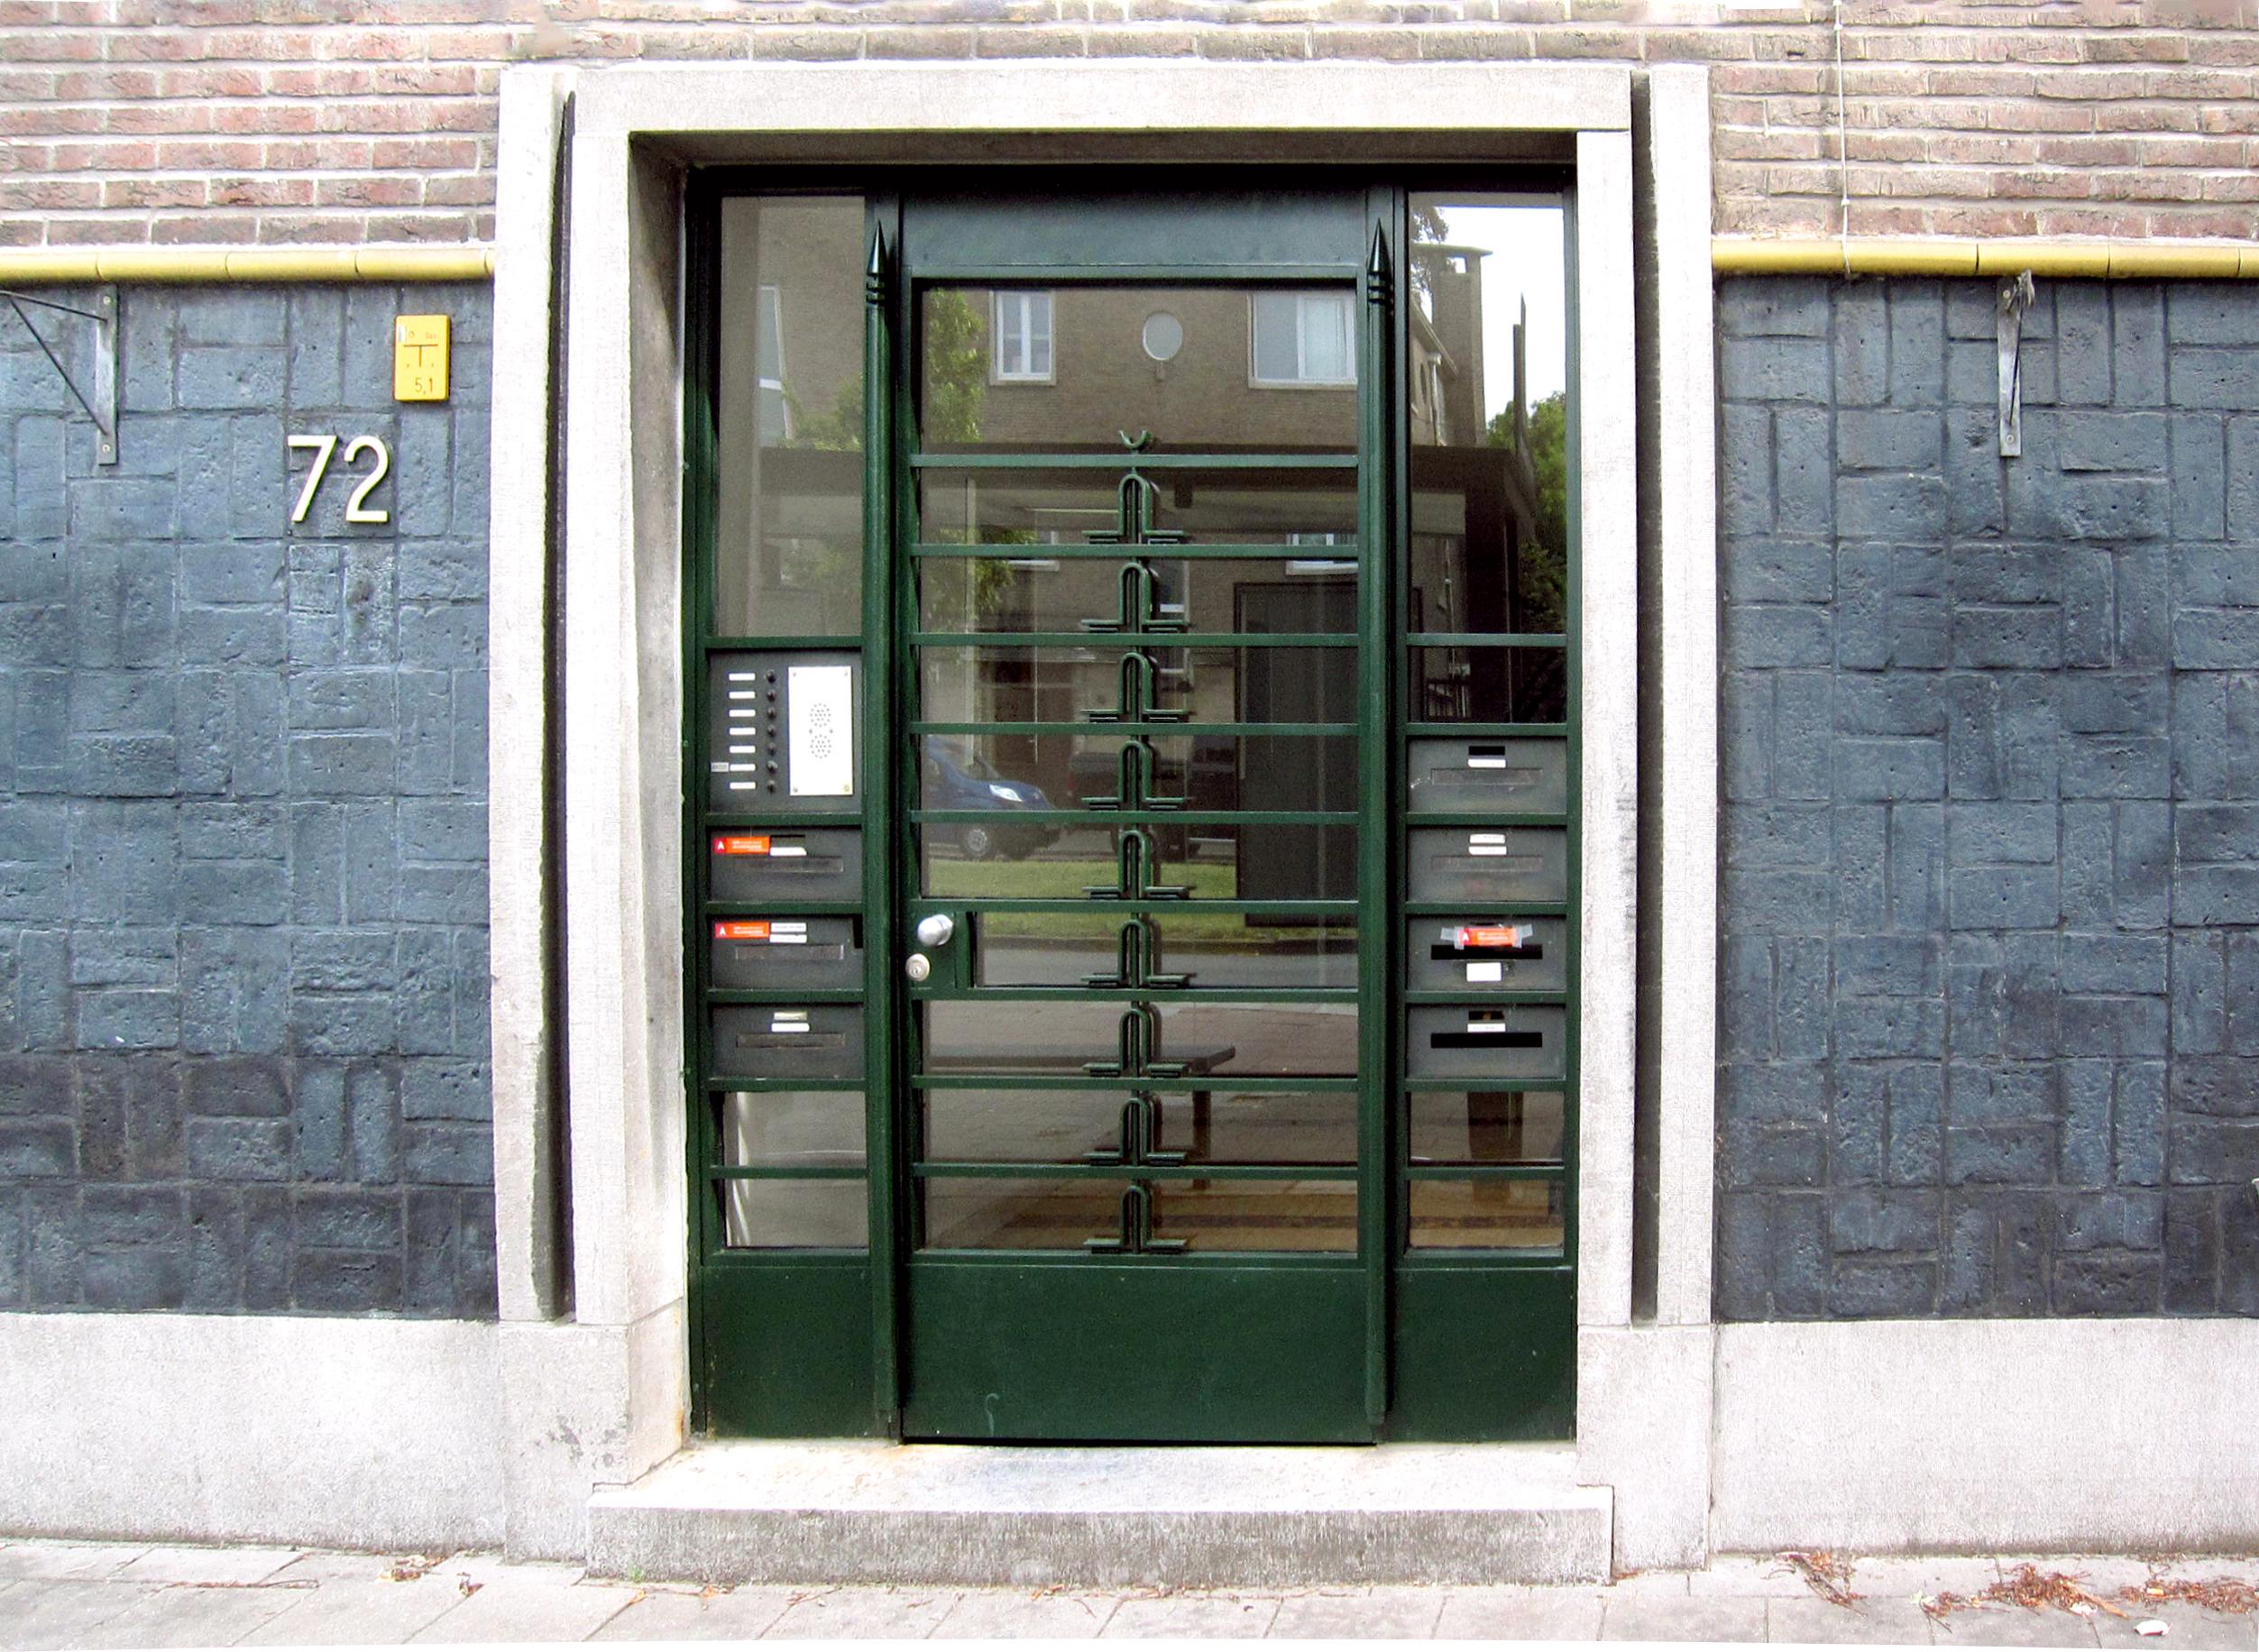 Stalen deur interbellum hersteld